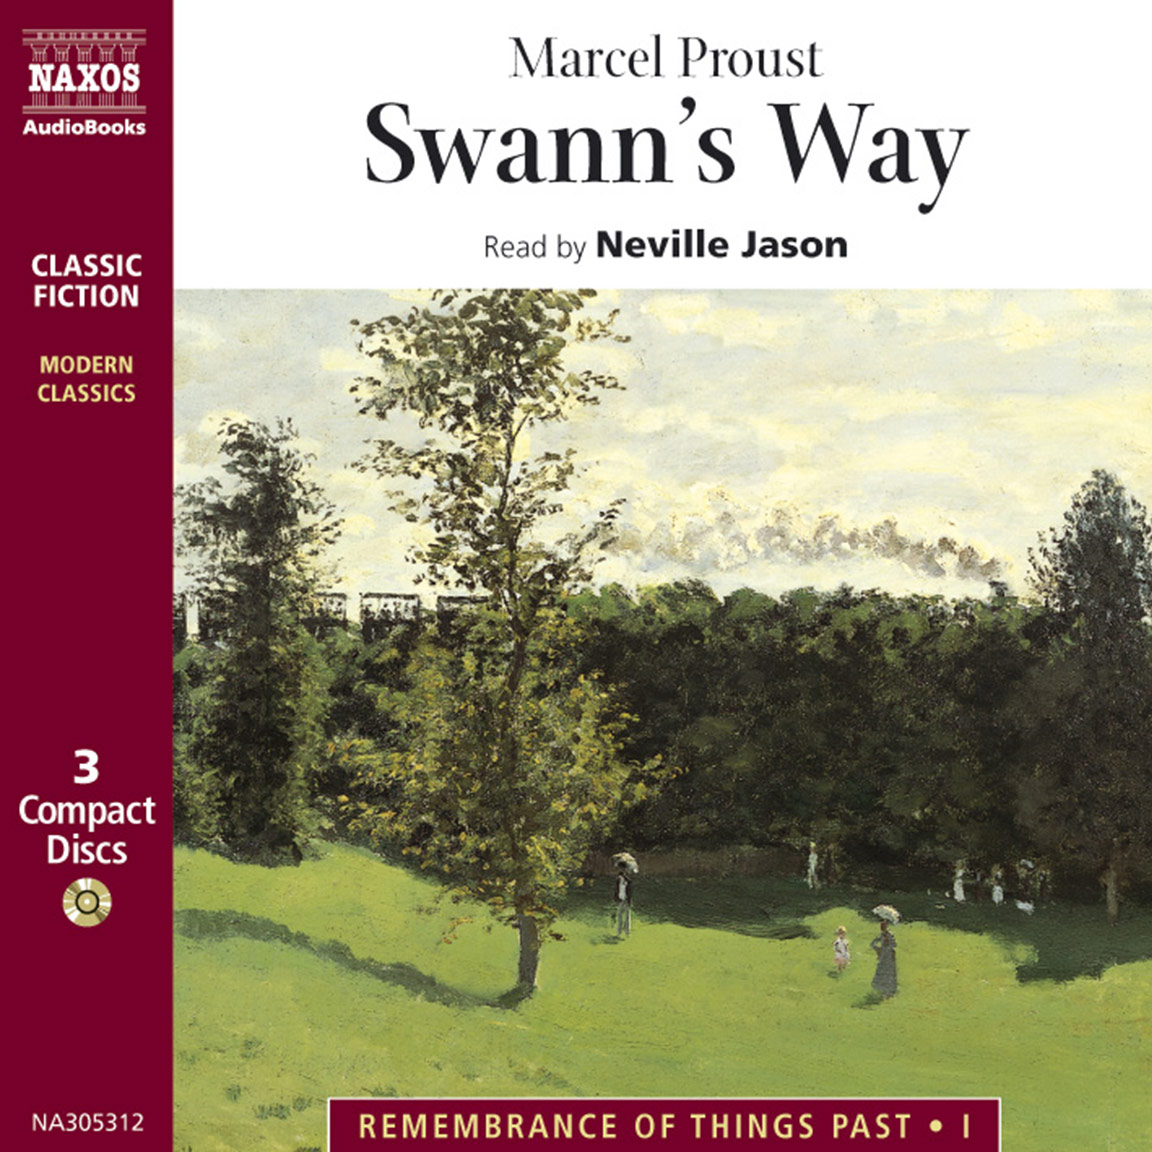 Swann's Way (abridged)